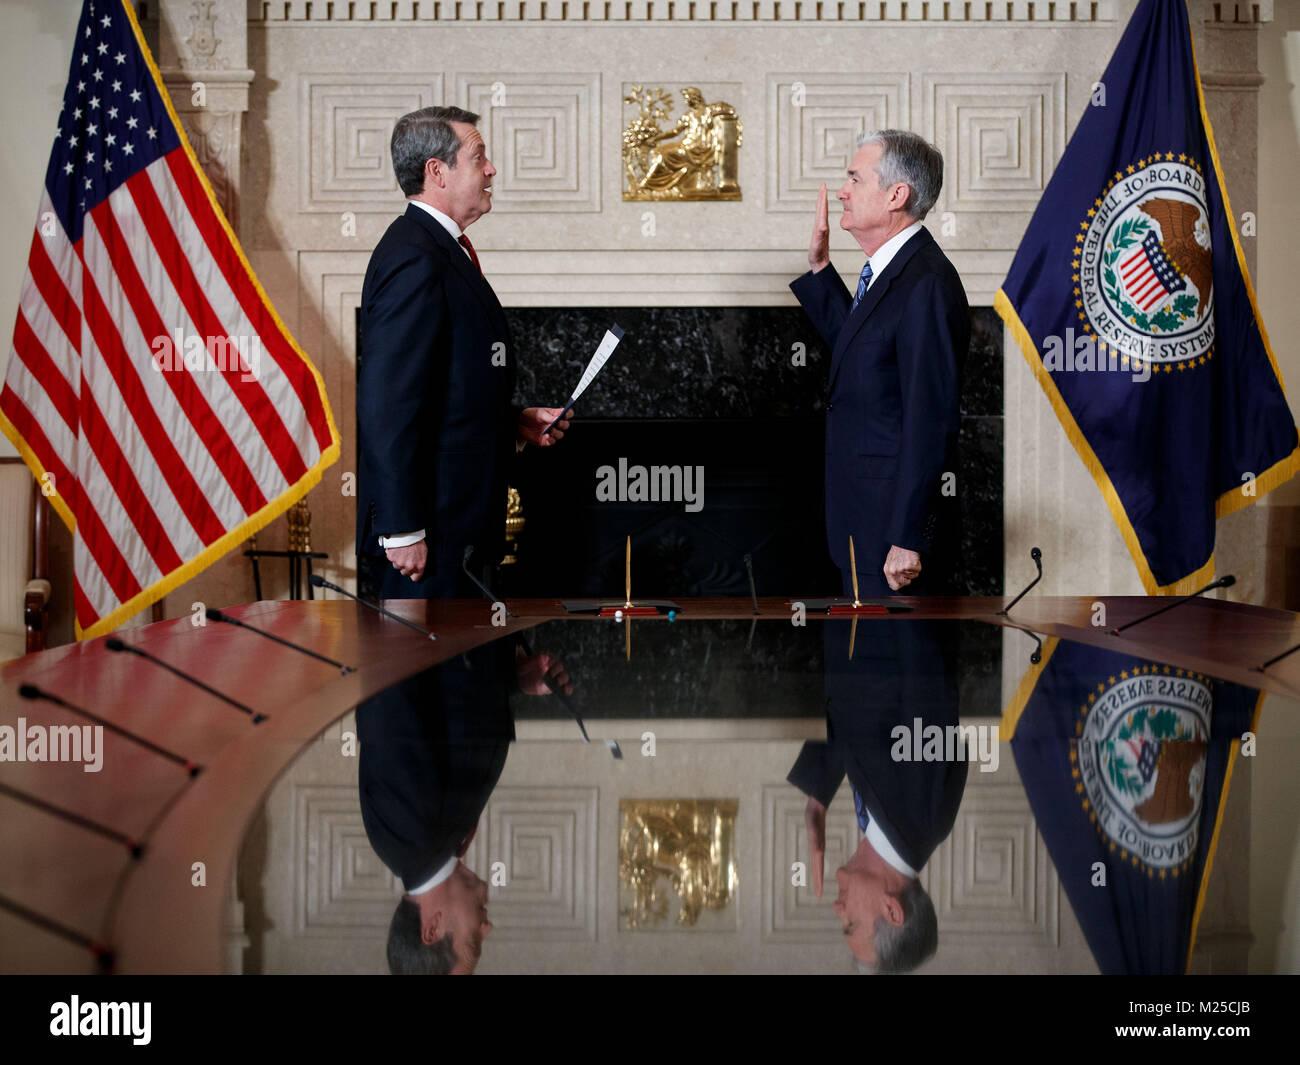 Washington, Washington, USA. 5th Feb, 2018. Jerome Powell (R) takes the oath of office as Chairman of the U.S. Federal - Stock Image